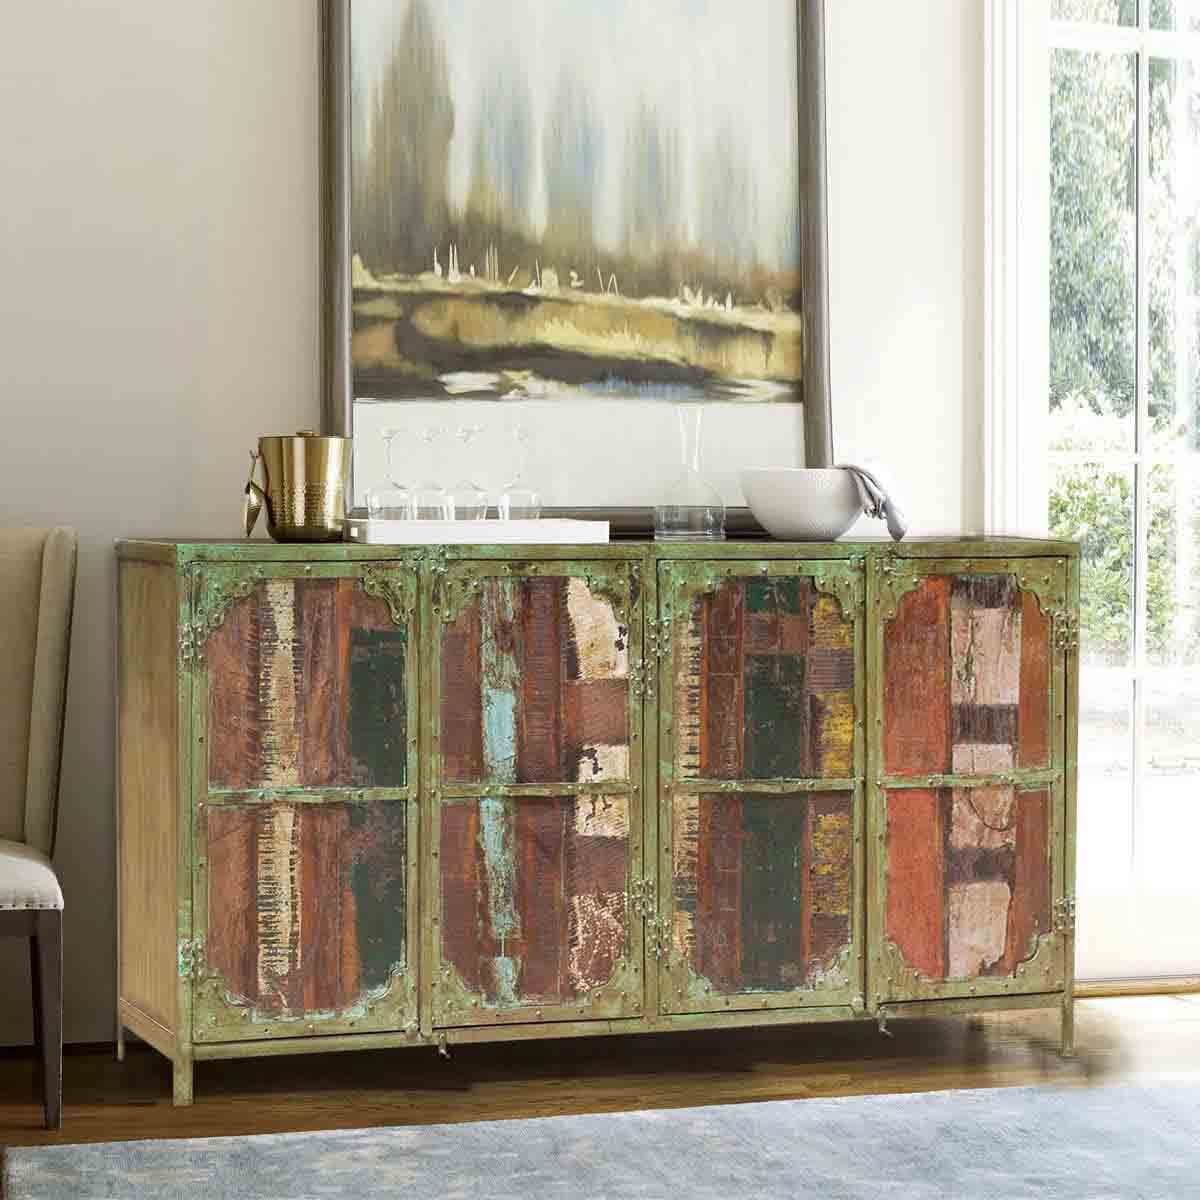 Appalachian rustic reclaimed wood door industrial large